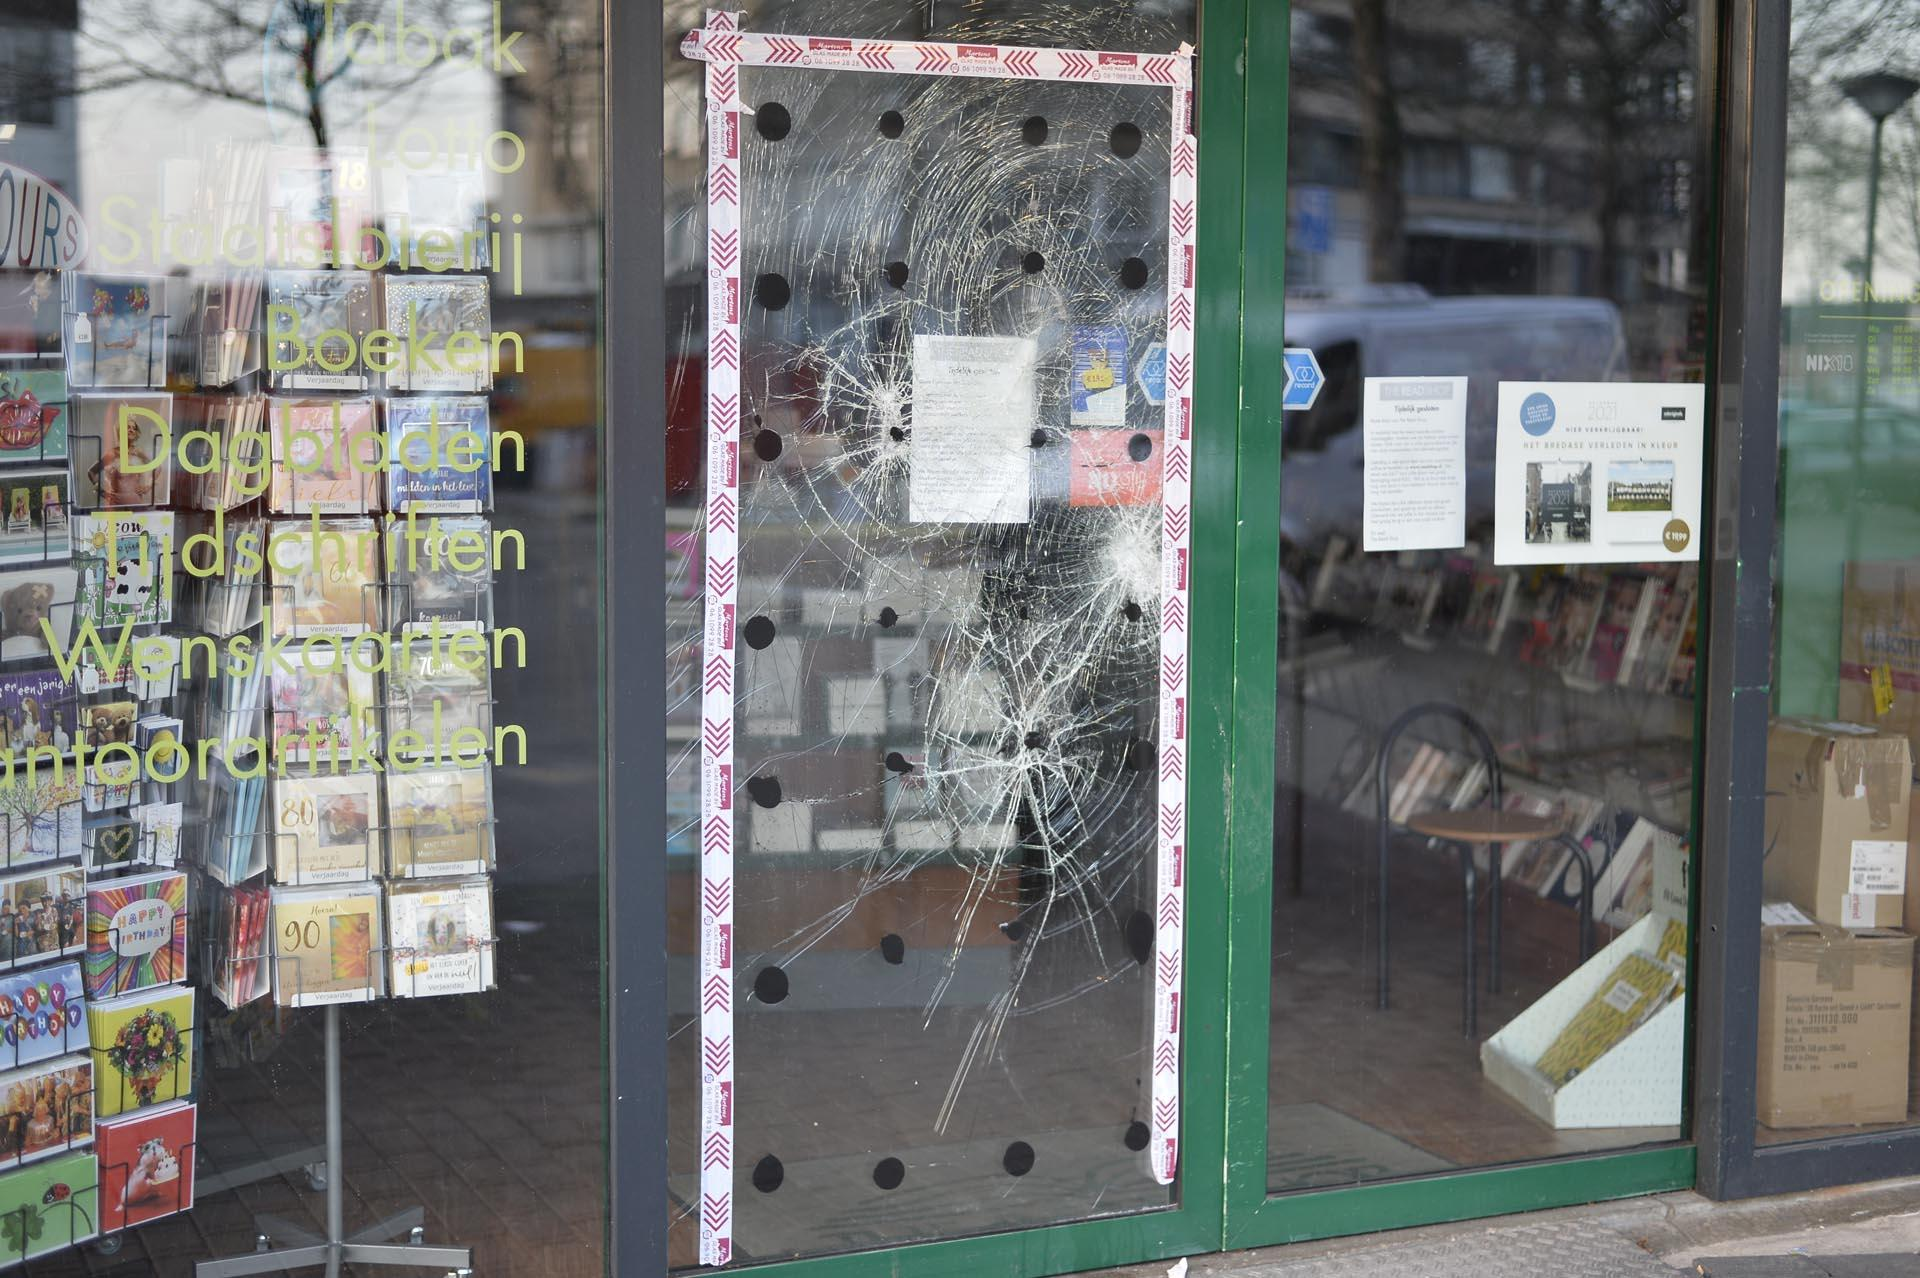 Tuinzigt Breda rellen corona avondklok The Read Shop